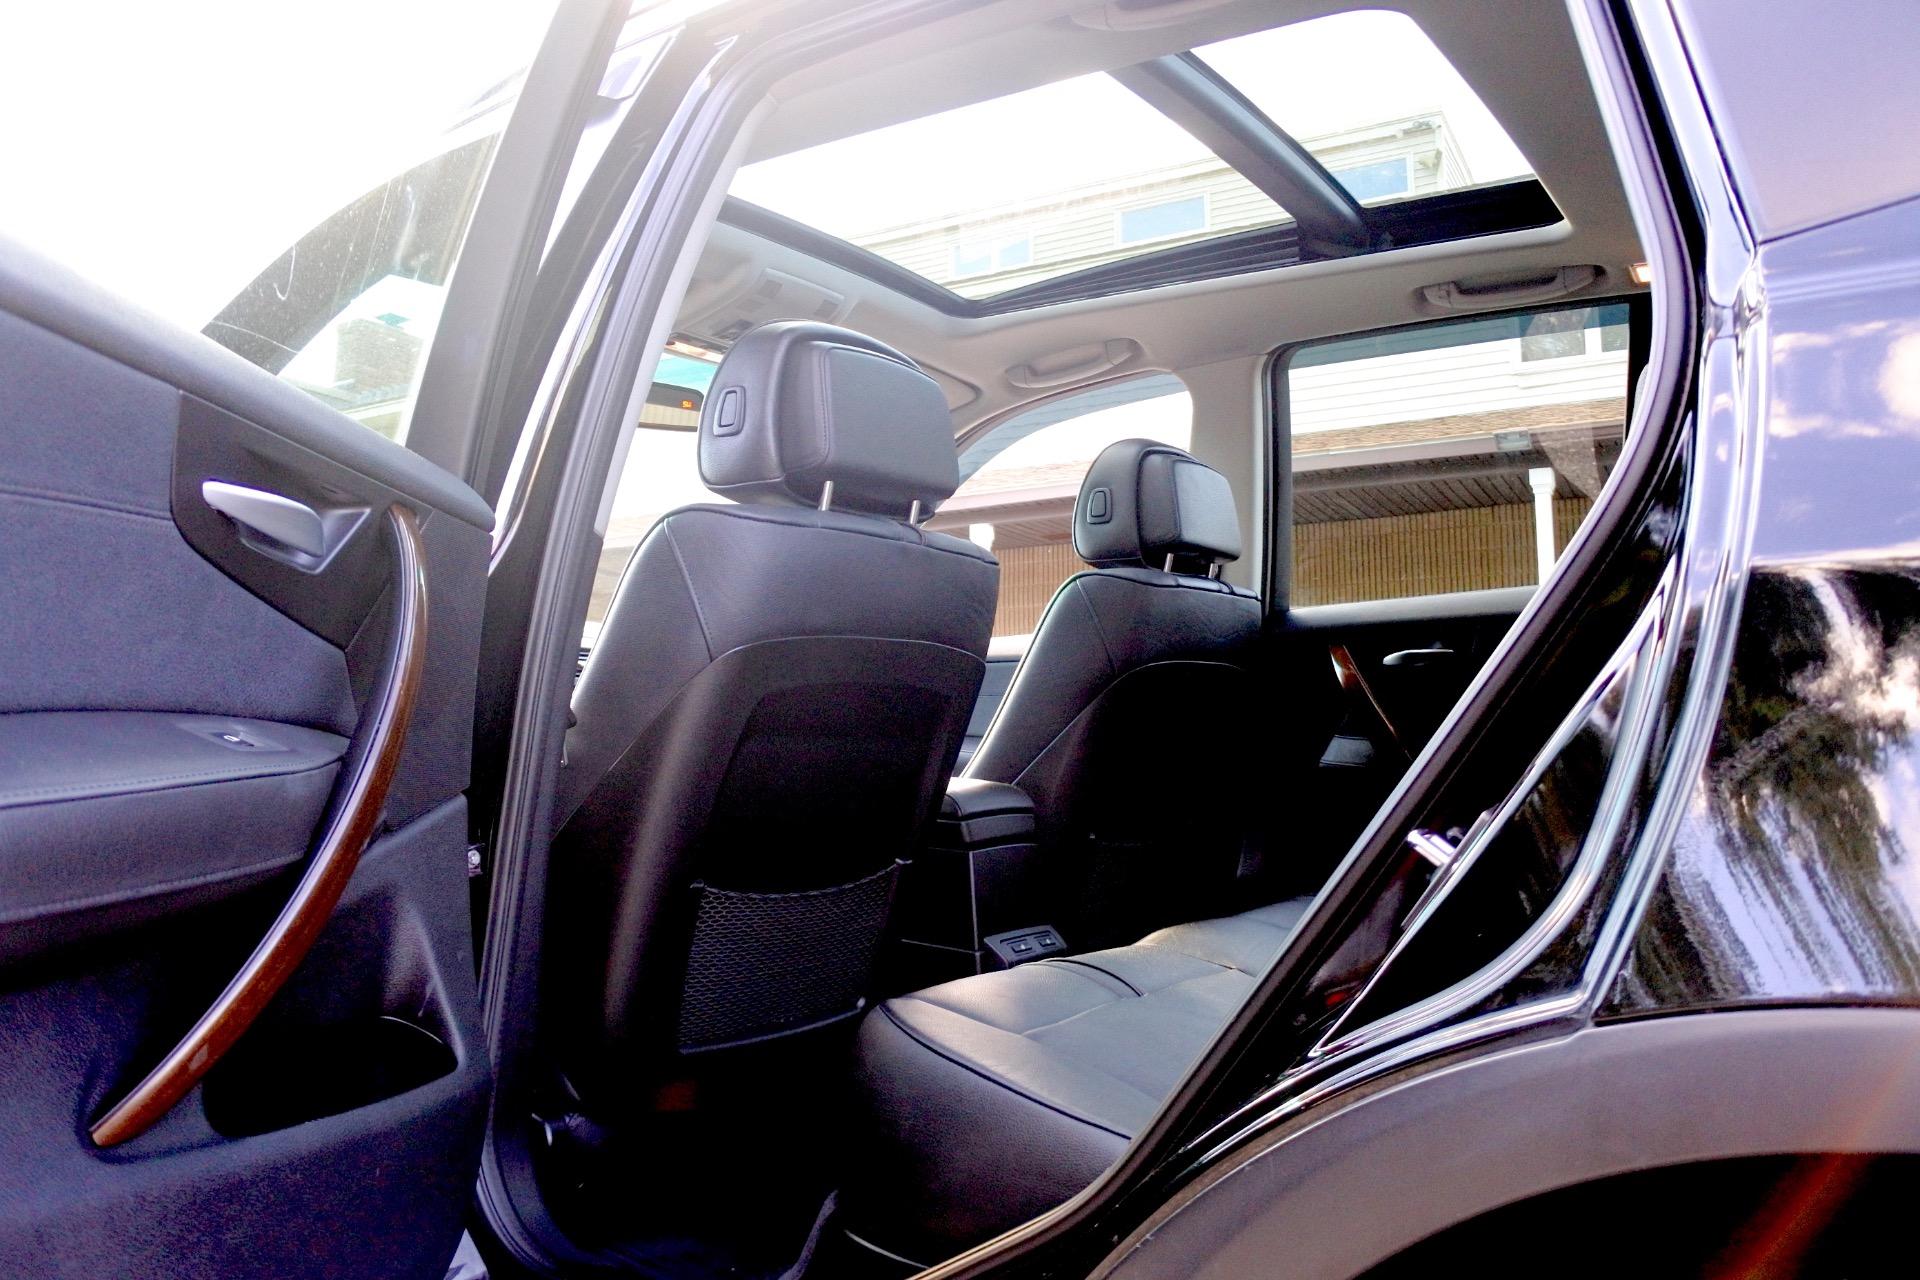 Used 2010 BMW X3 AWD 4dr 30i Used 2010 BMW X3 AWD 4dr 30i for sale  at Metro West Motorcars LLC in Shrewsbury MA 14